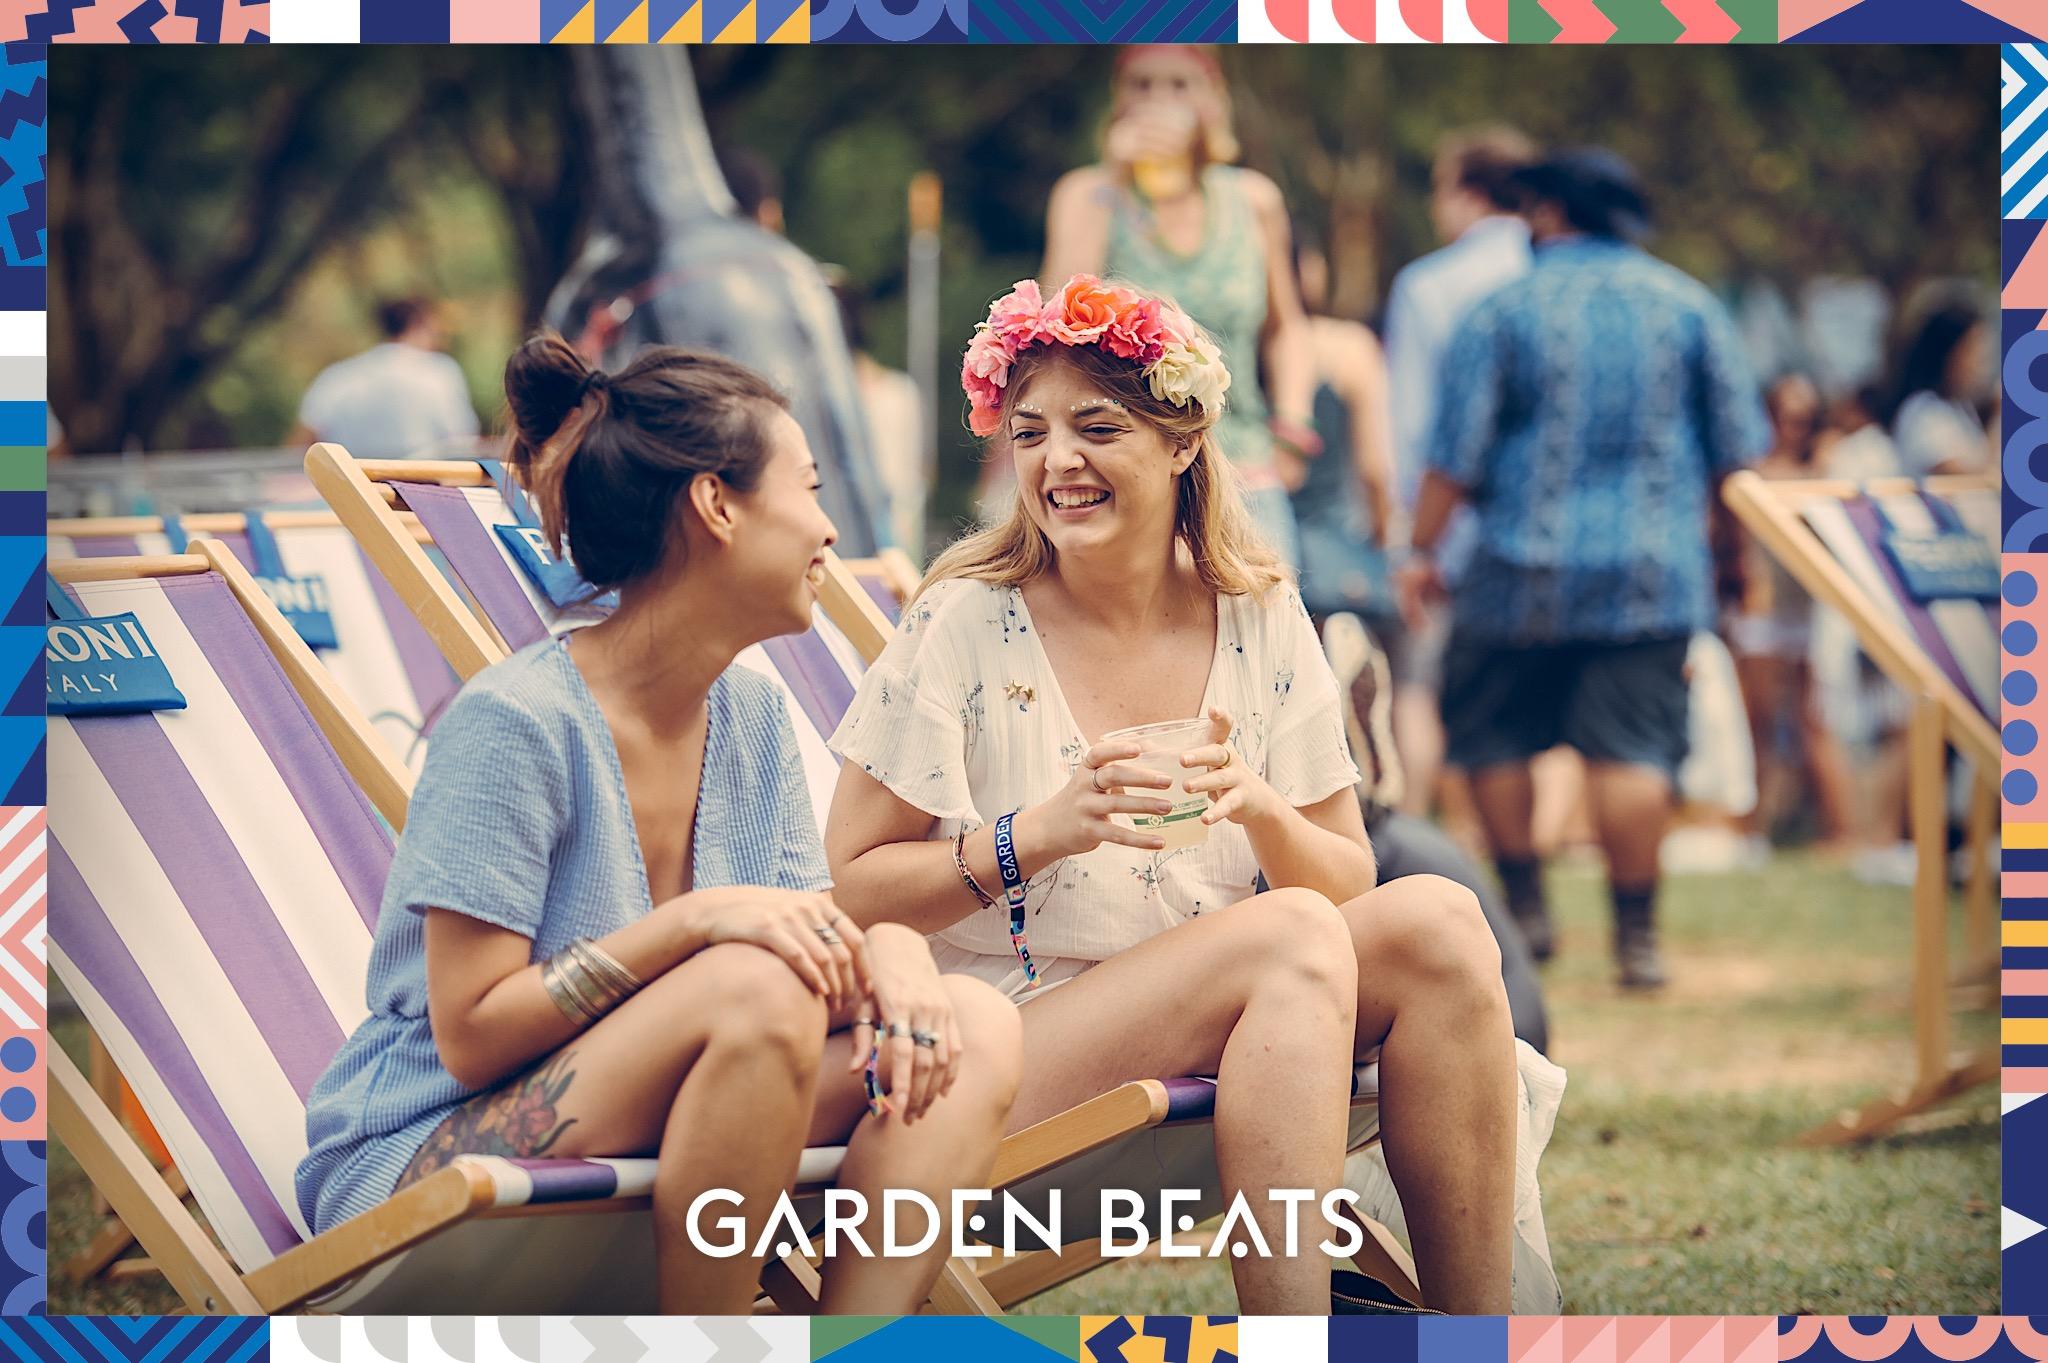 03032018_GardenBeats_Colossal464_Watermarked.jpg